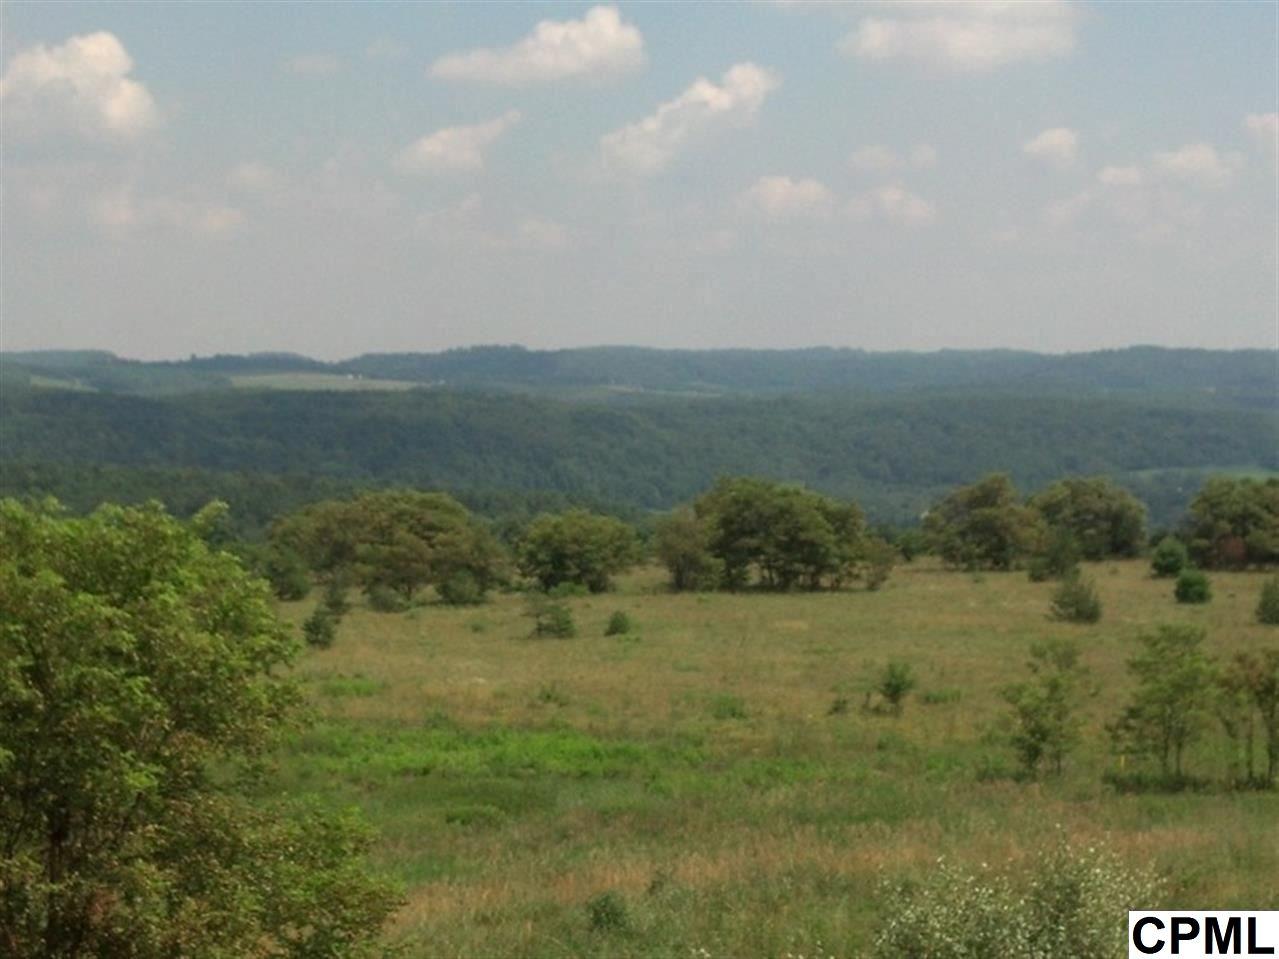 Mahaffey Grampian Hwy, Greenwood Township, PA 15757